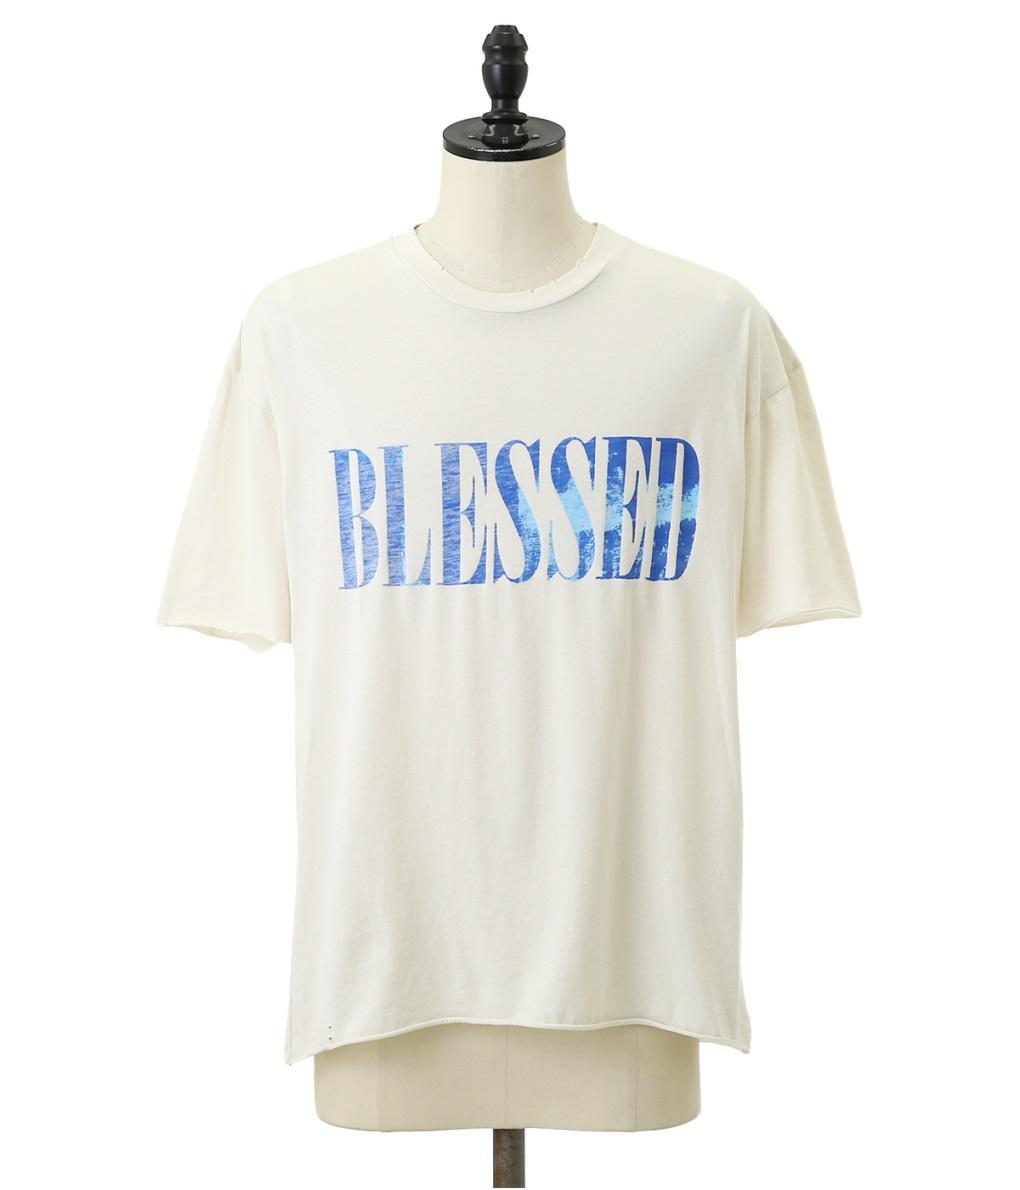 ALCHEMIST / アルケミスト : BLESSED TSHIRT : ブレスド ティーシャツ 19SS 19春夏 : AL-S19-0000-060 【WAX】